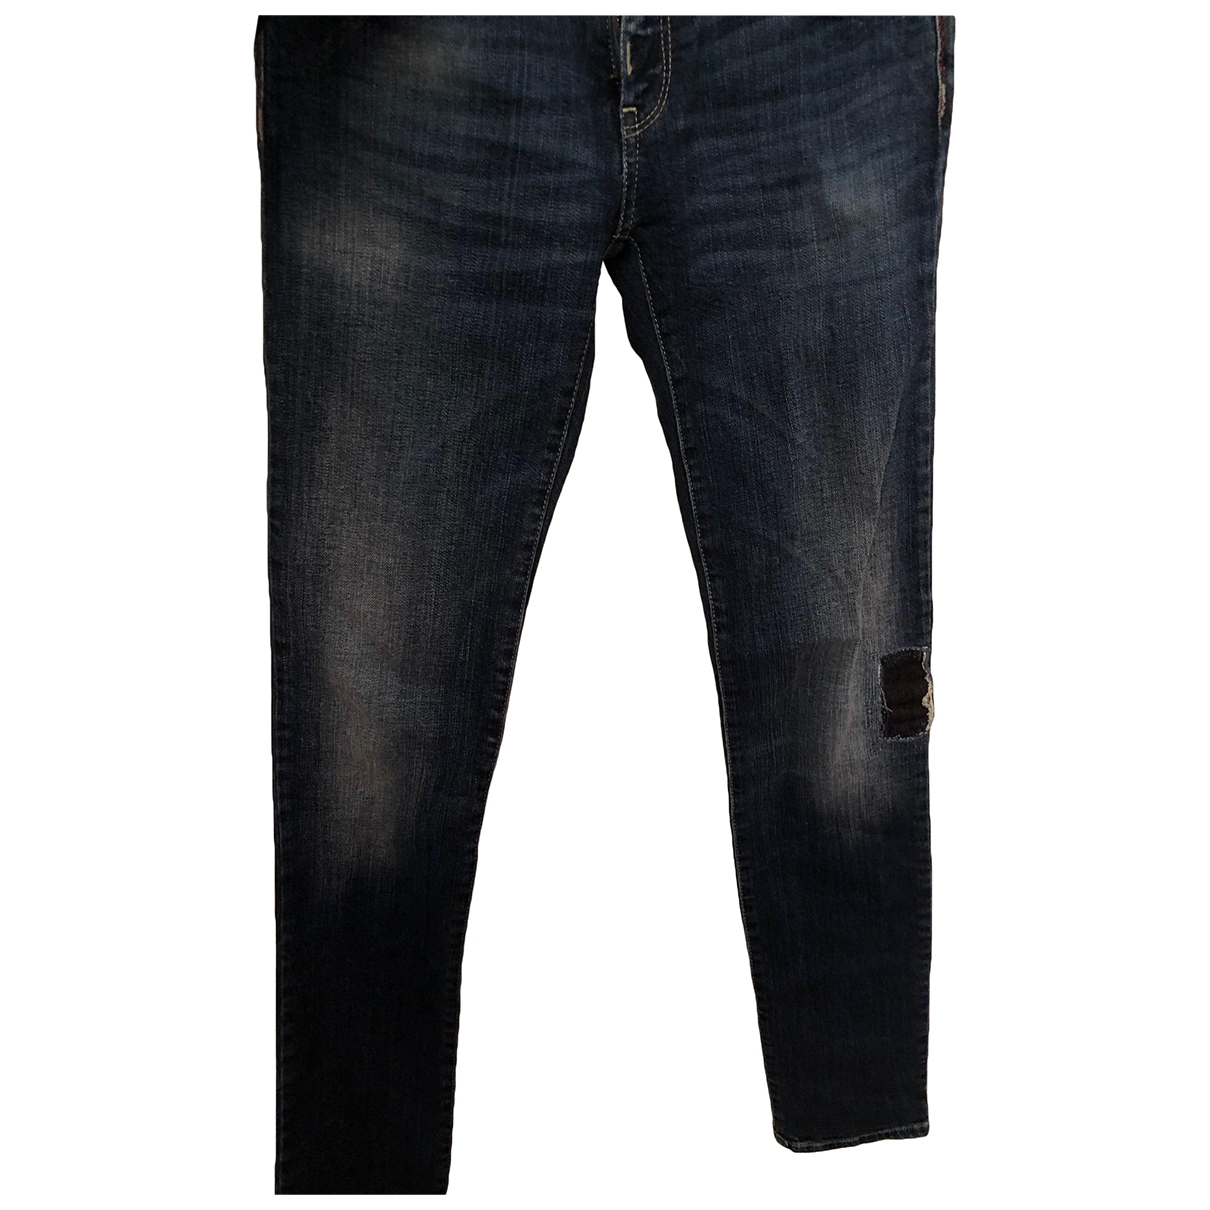 Armani Jeans \N Blue Denim - Jeans Jeans for Women 24 US